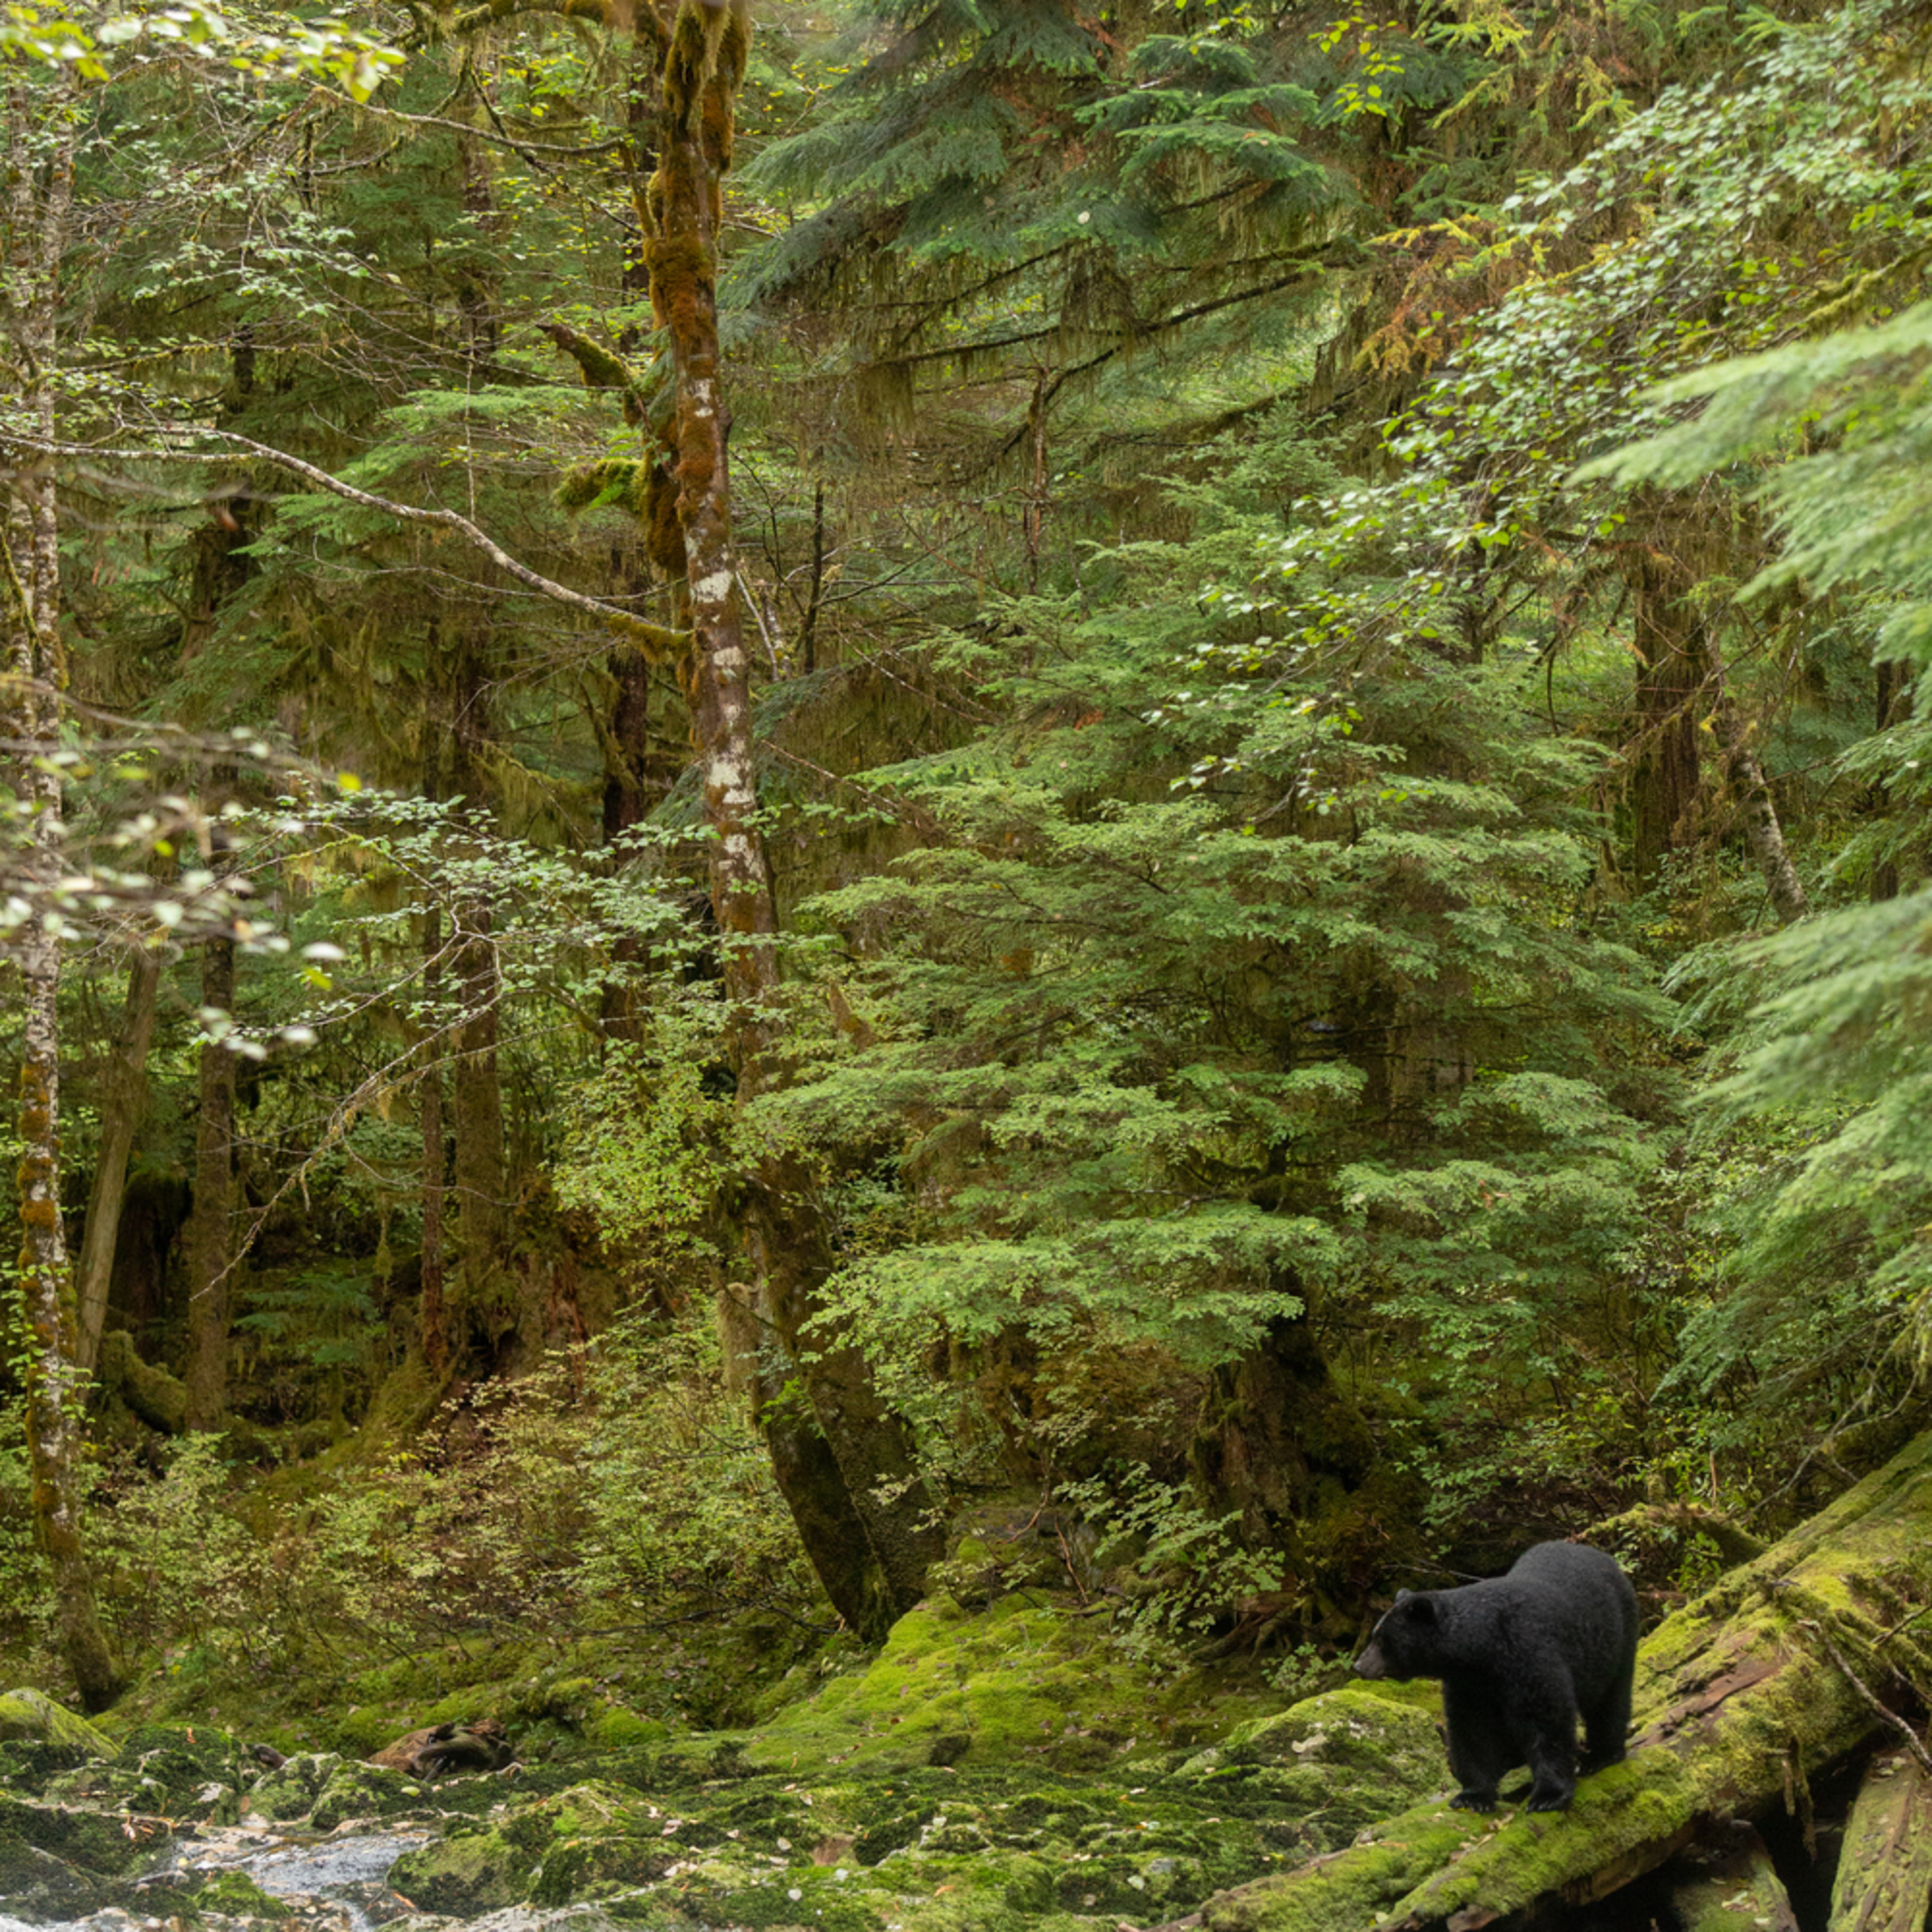 Great bear rainforest october 10 201804487 tucjmr